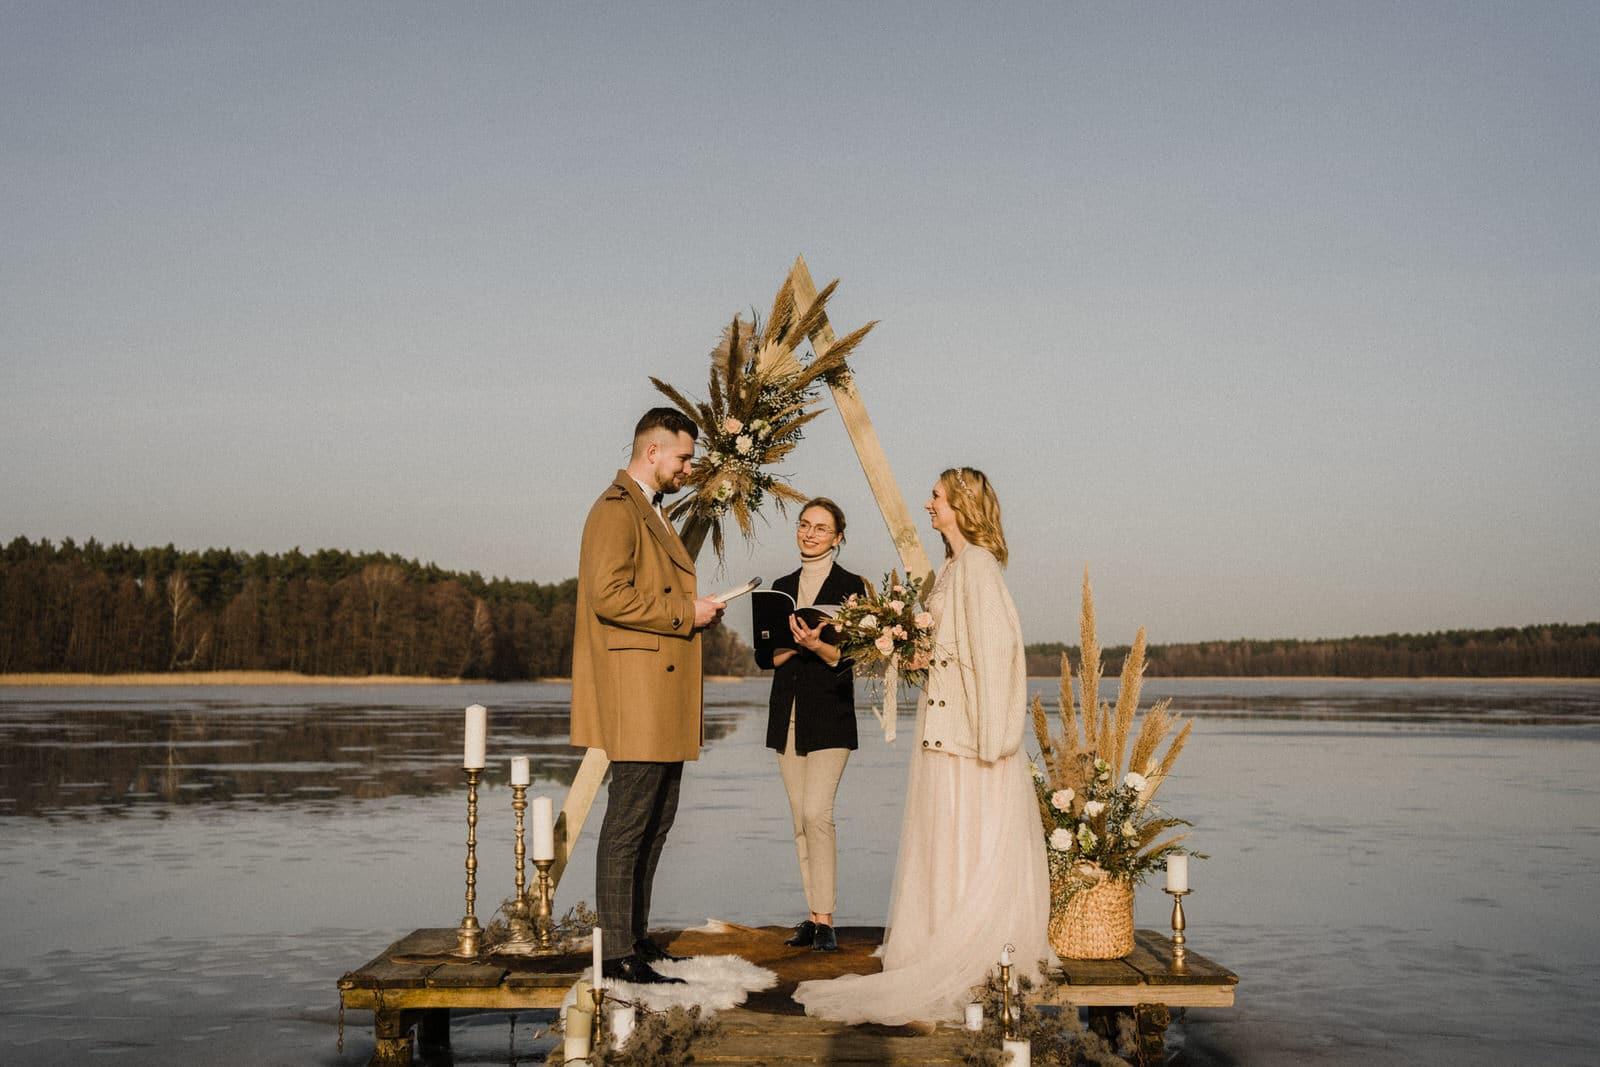 pomysł na mały ślub